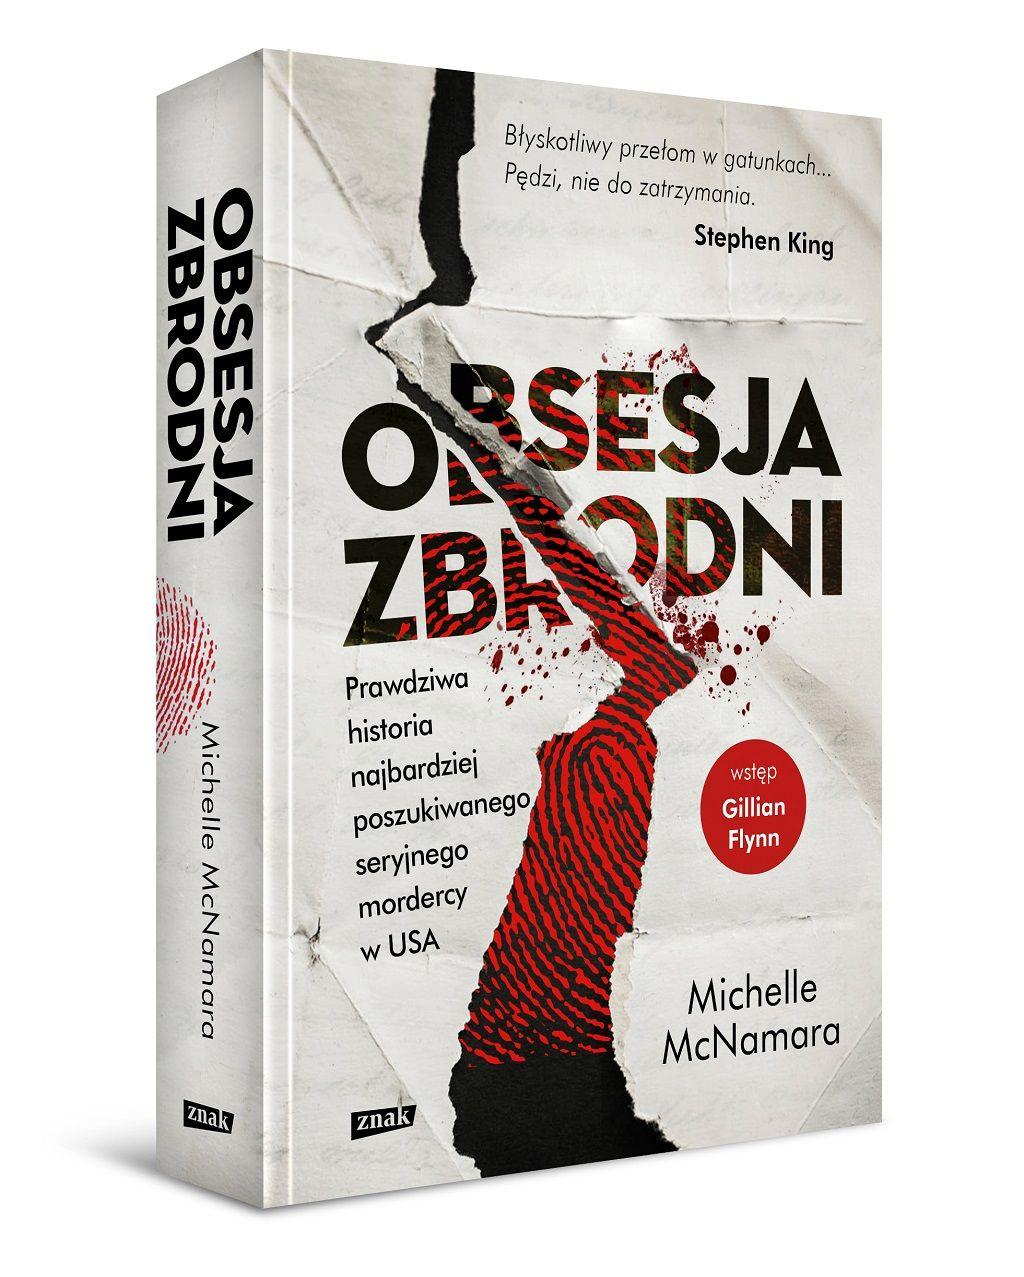 Michelle McNamara – Obsesja zbrodni